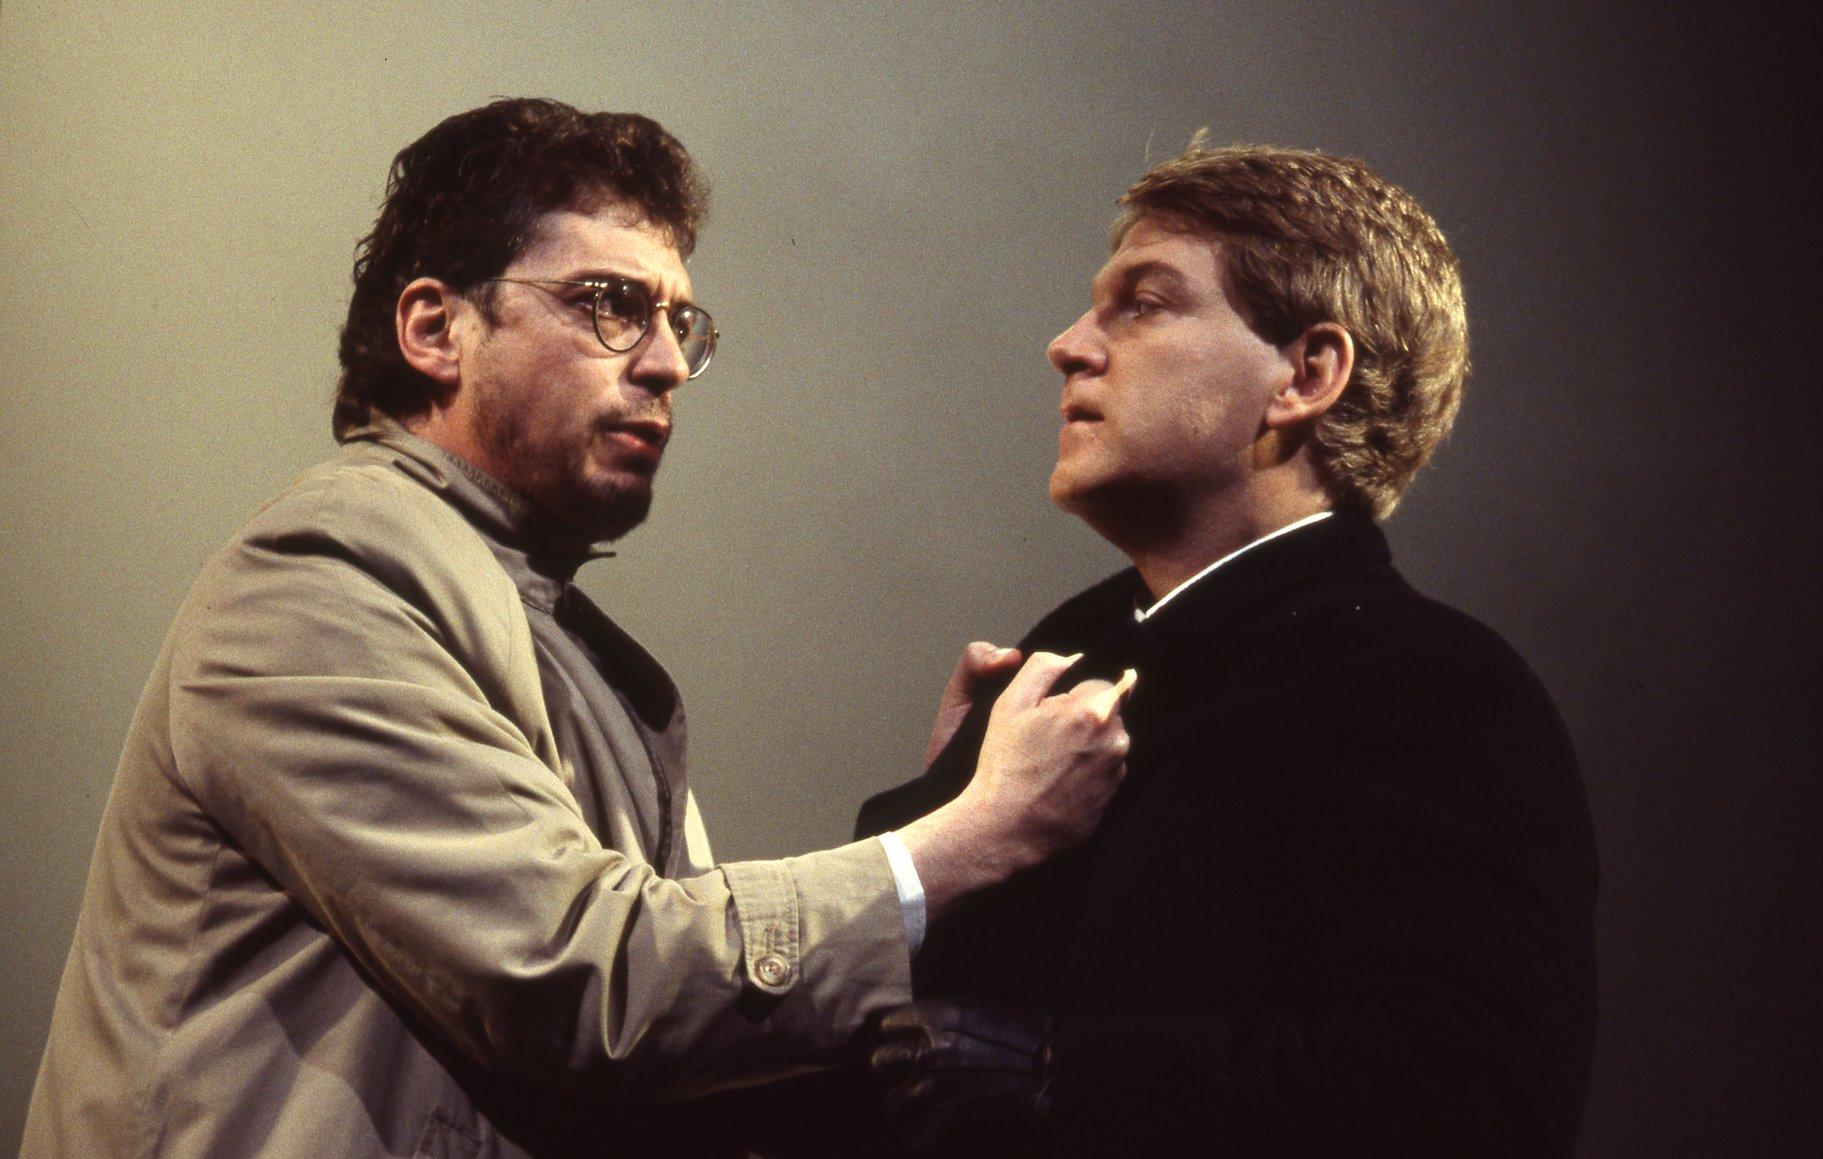 Horatio holds onto Hamlet.